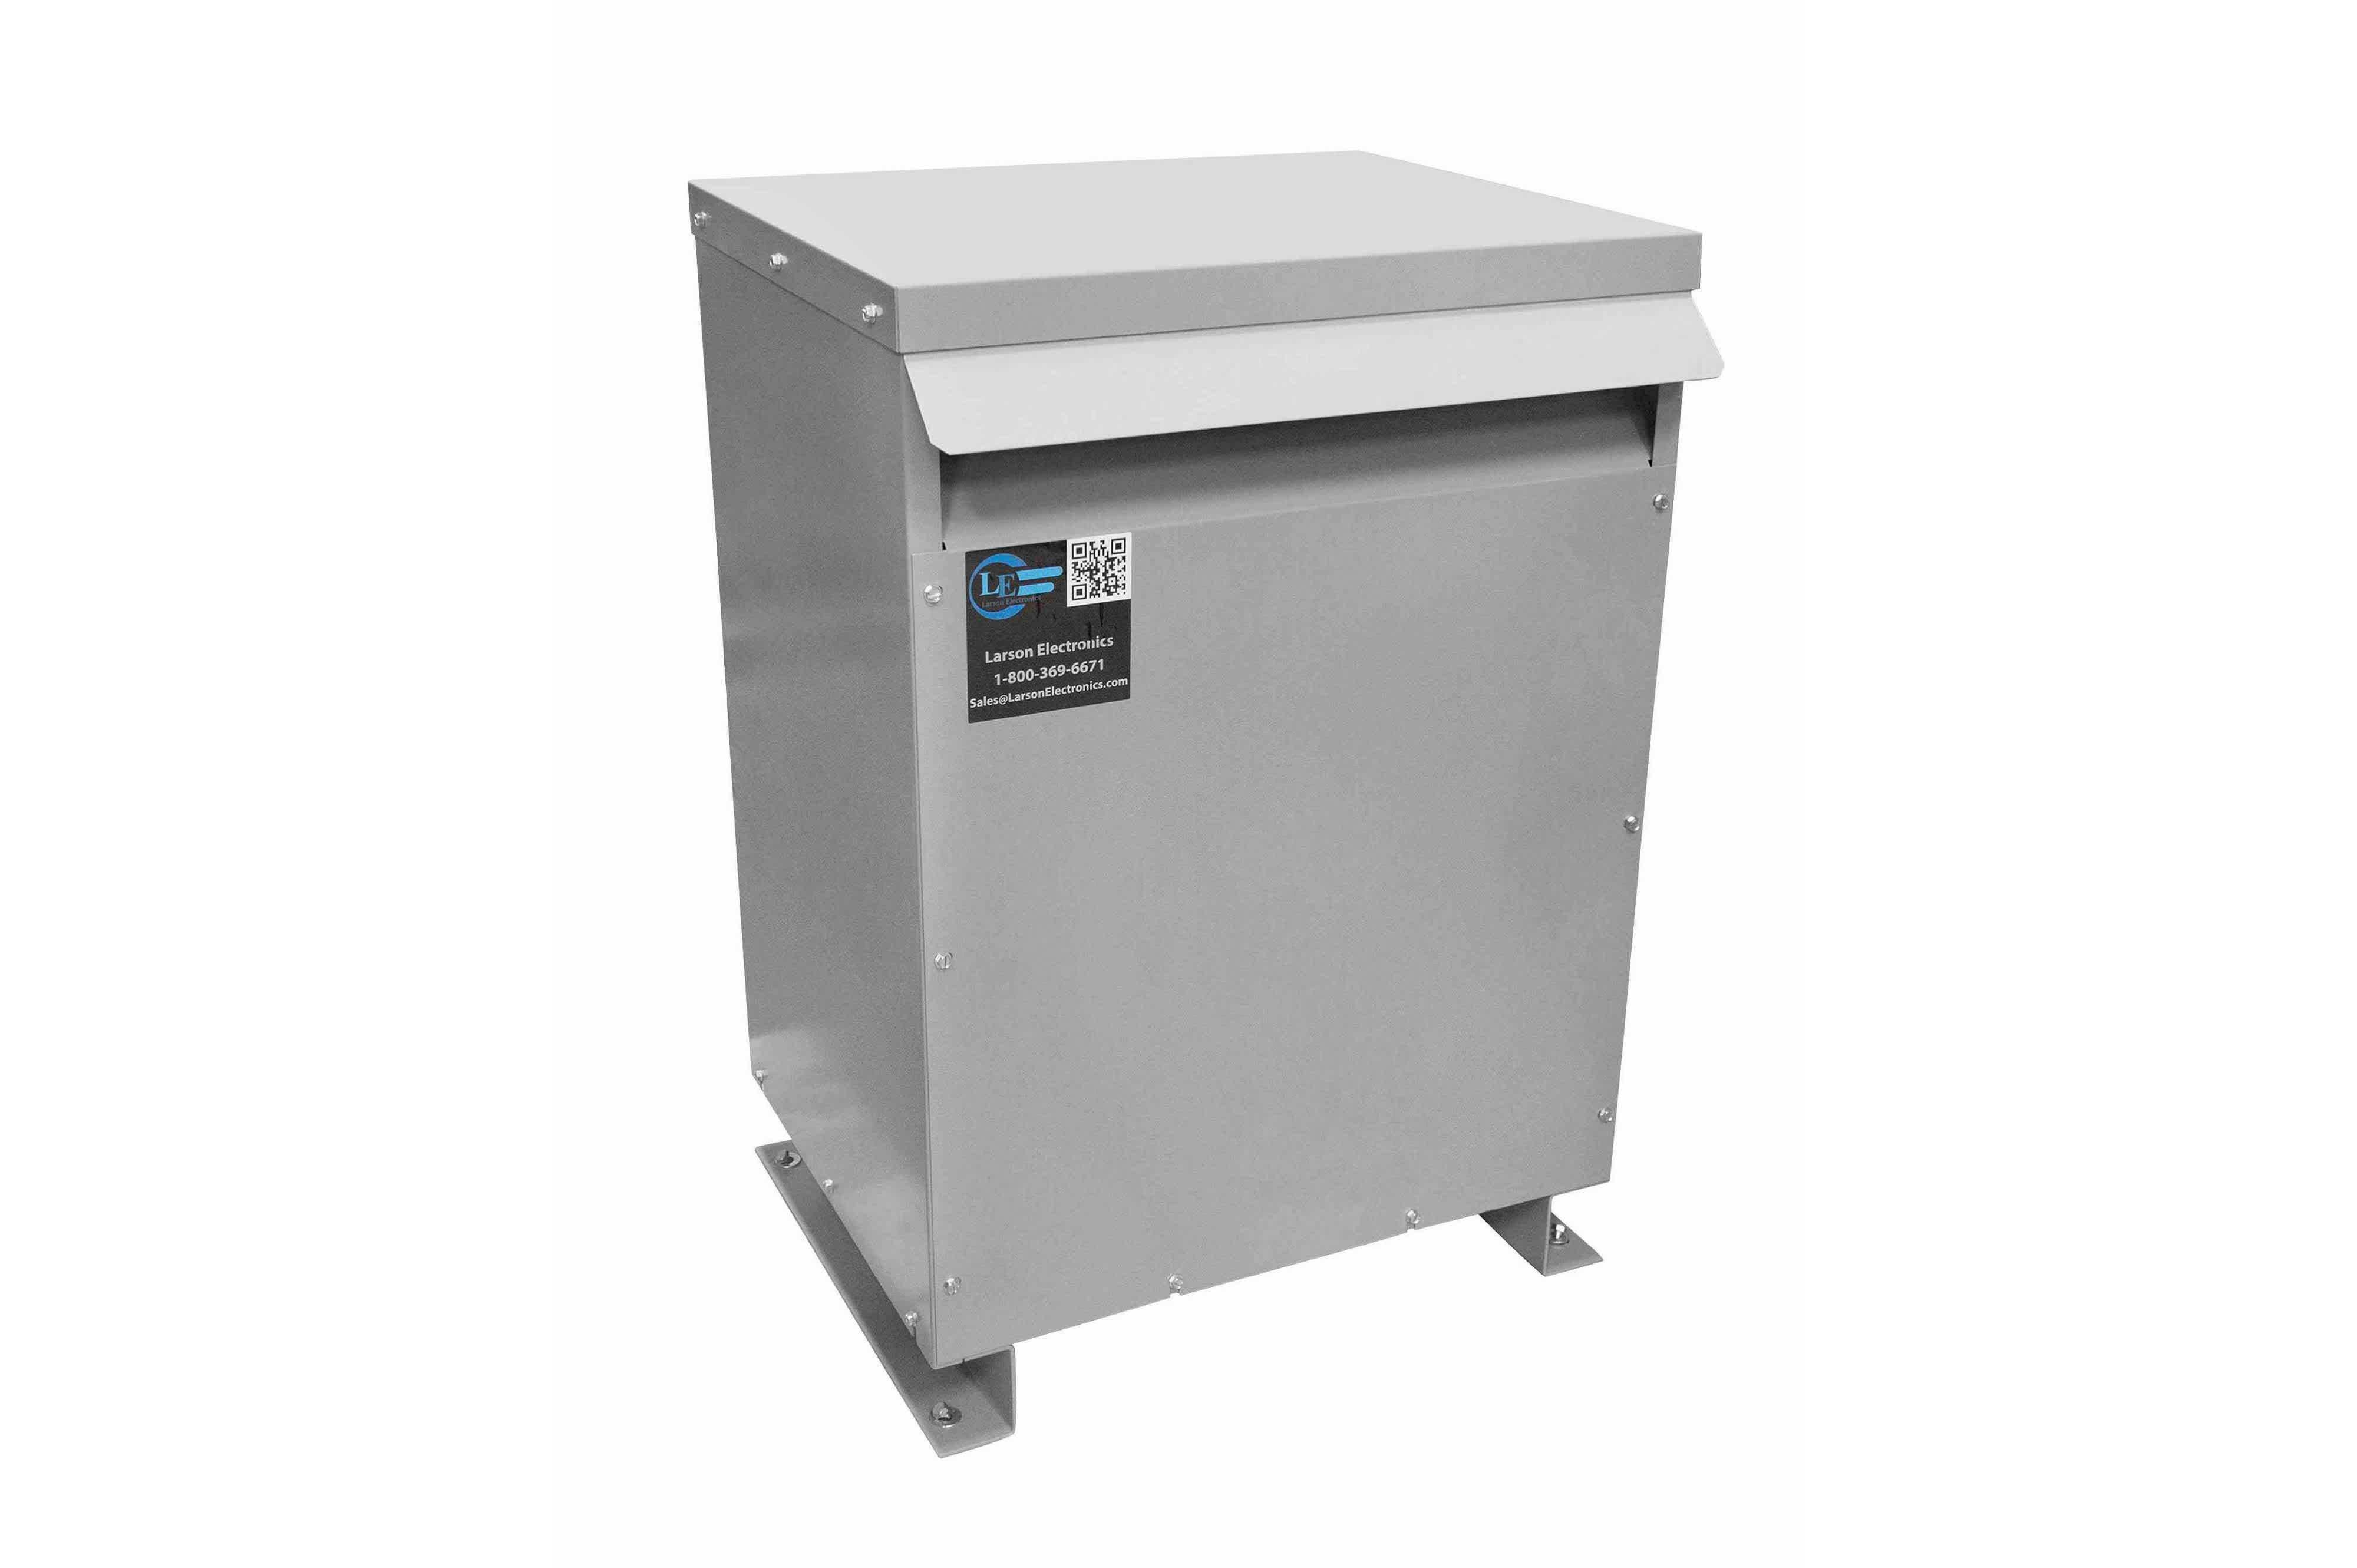 500 kVA 3PH Isolation Transformer, 600V Wye Primary, 240V Delta Secondary, N3R, Ventilated, 60 Hz